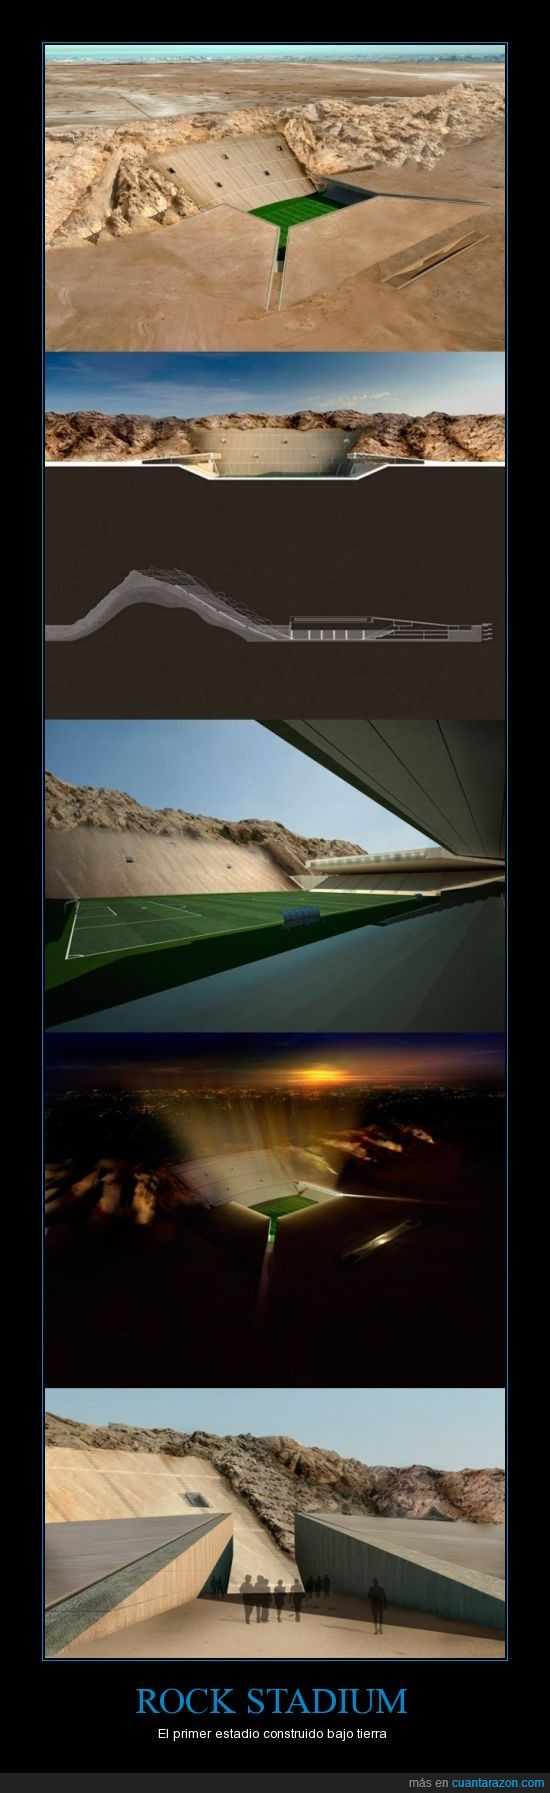 arabia,desierto,estadio,futbol,subterraneo,tierra